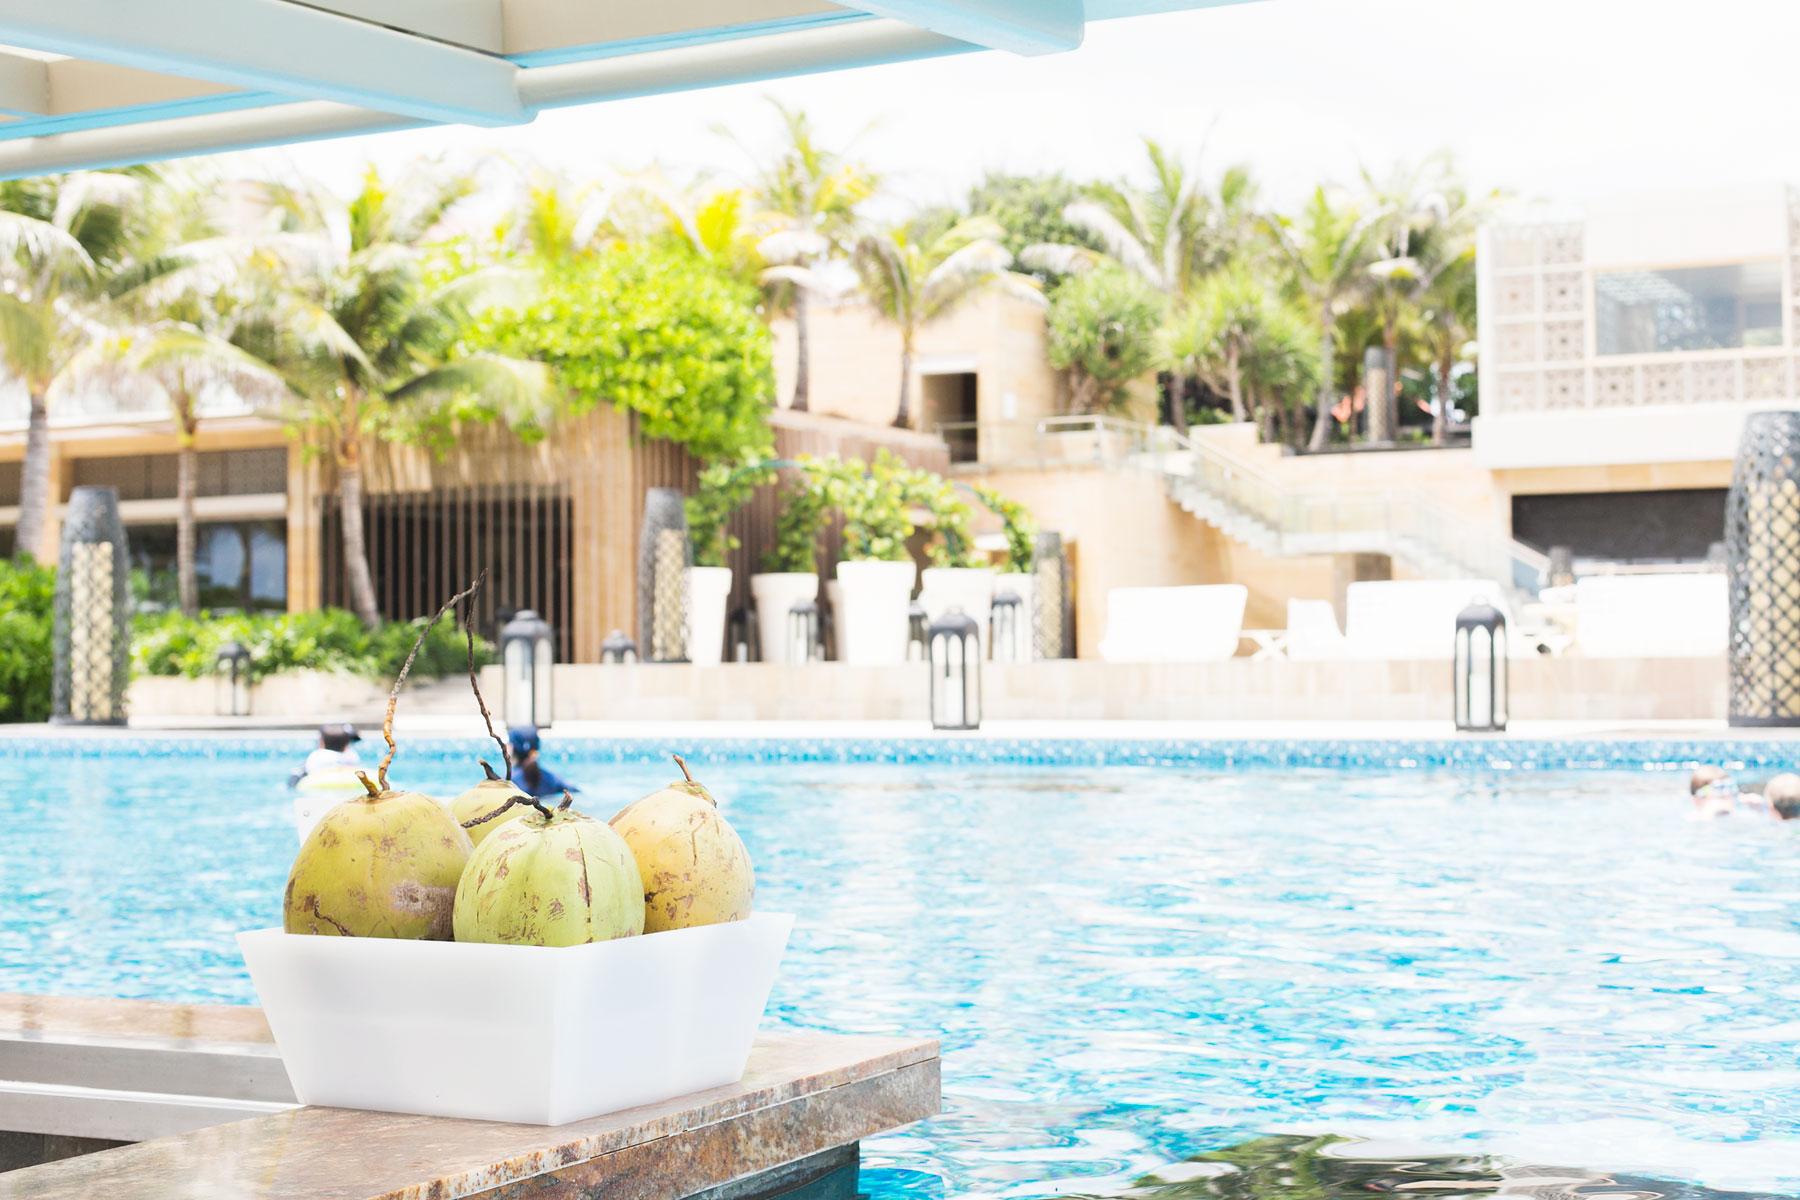 The Malia Resort  in Bali